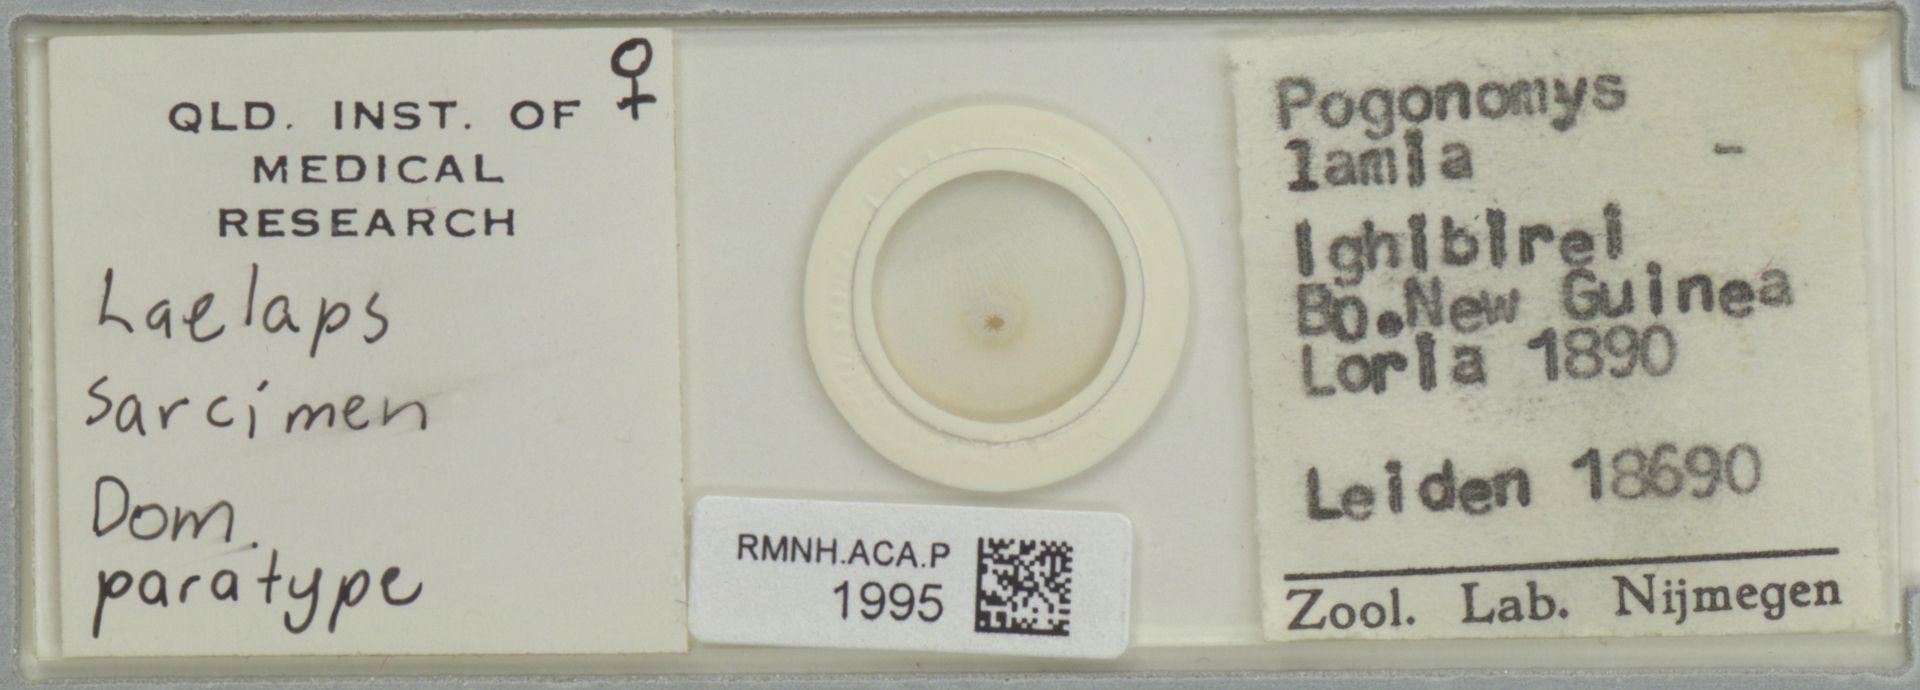 RMNH.ACA.P.1995 | Laelaps sarcimen Domrow